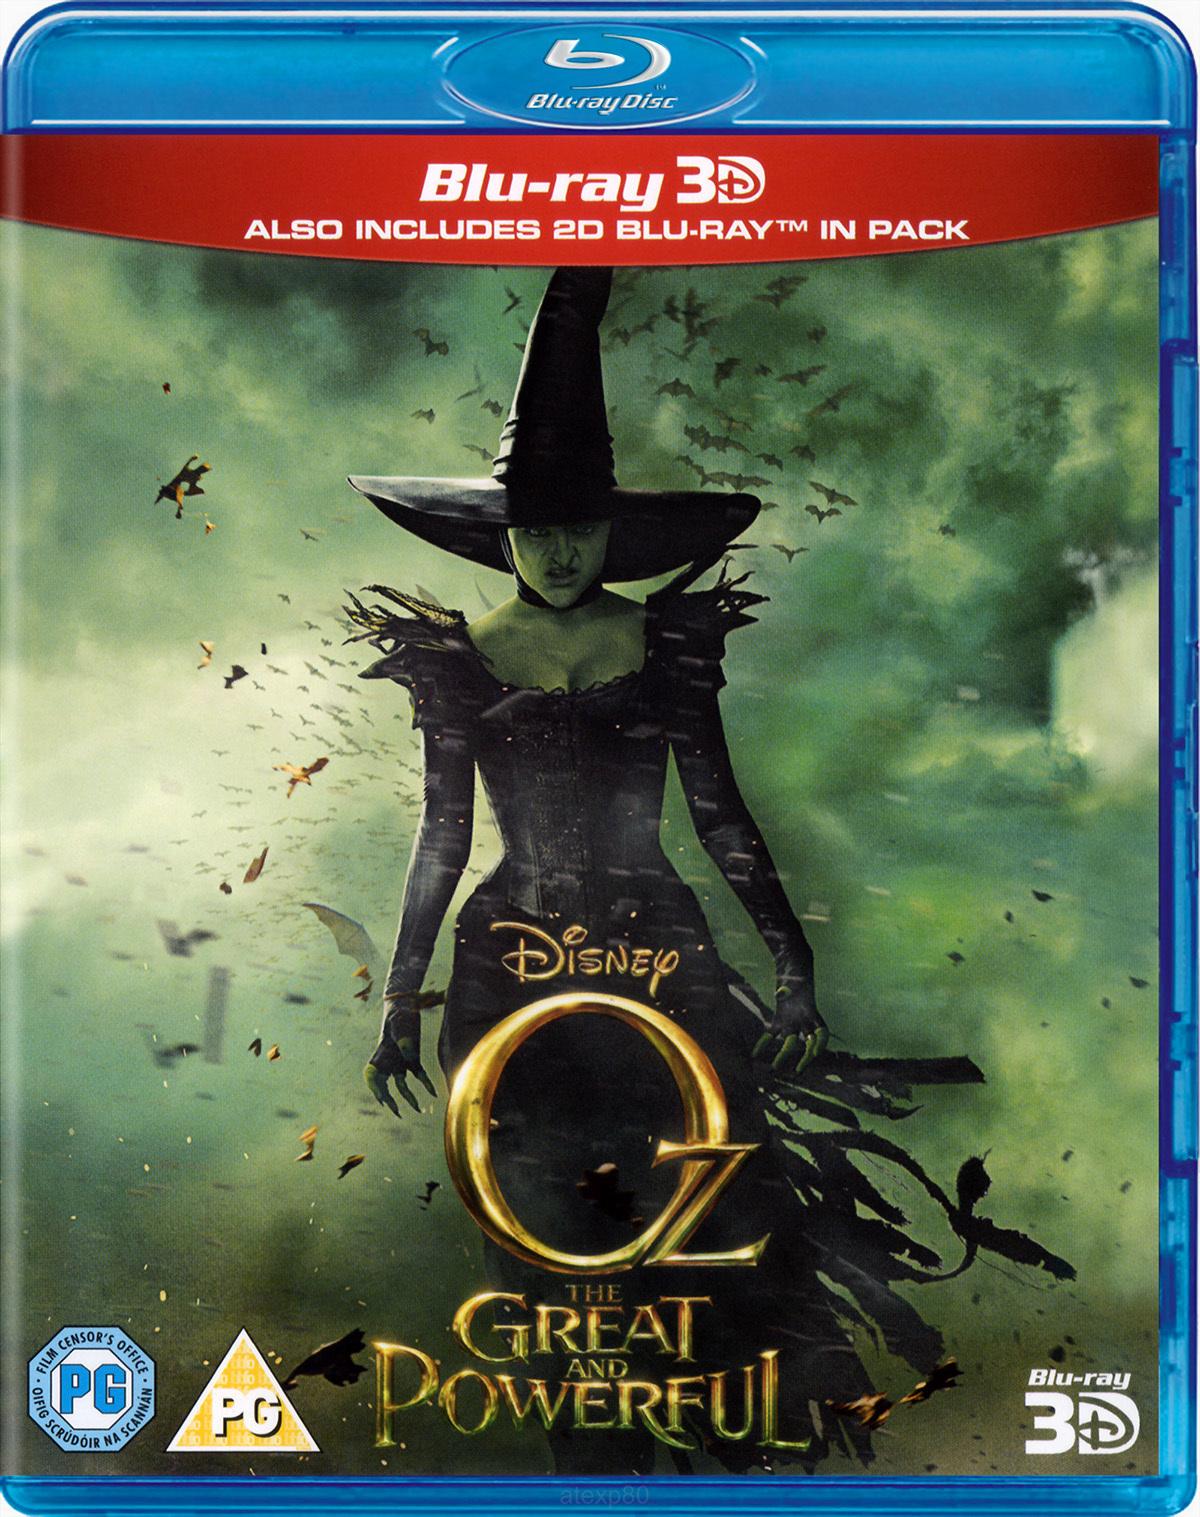 Sam's Club: Blu-ray 3D Oz el Poderoso en $49